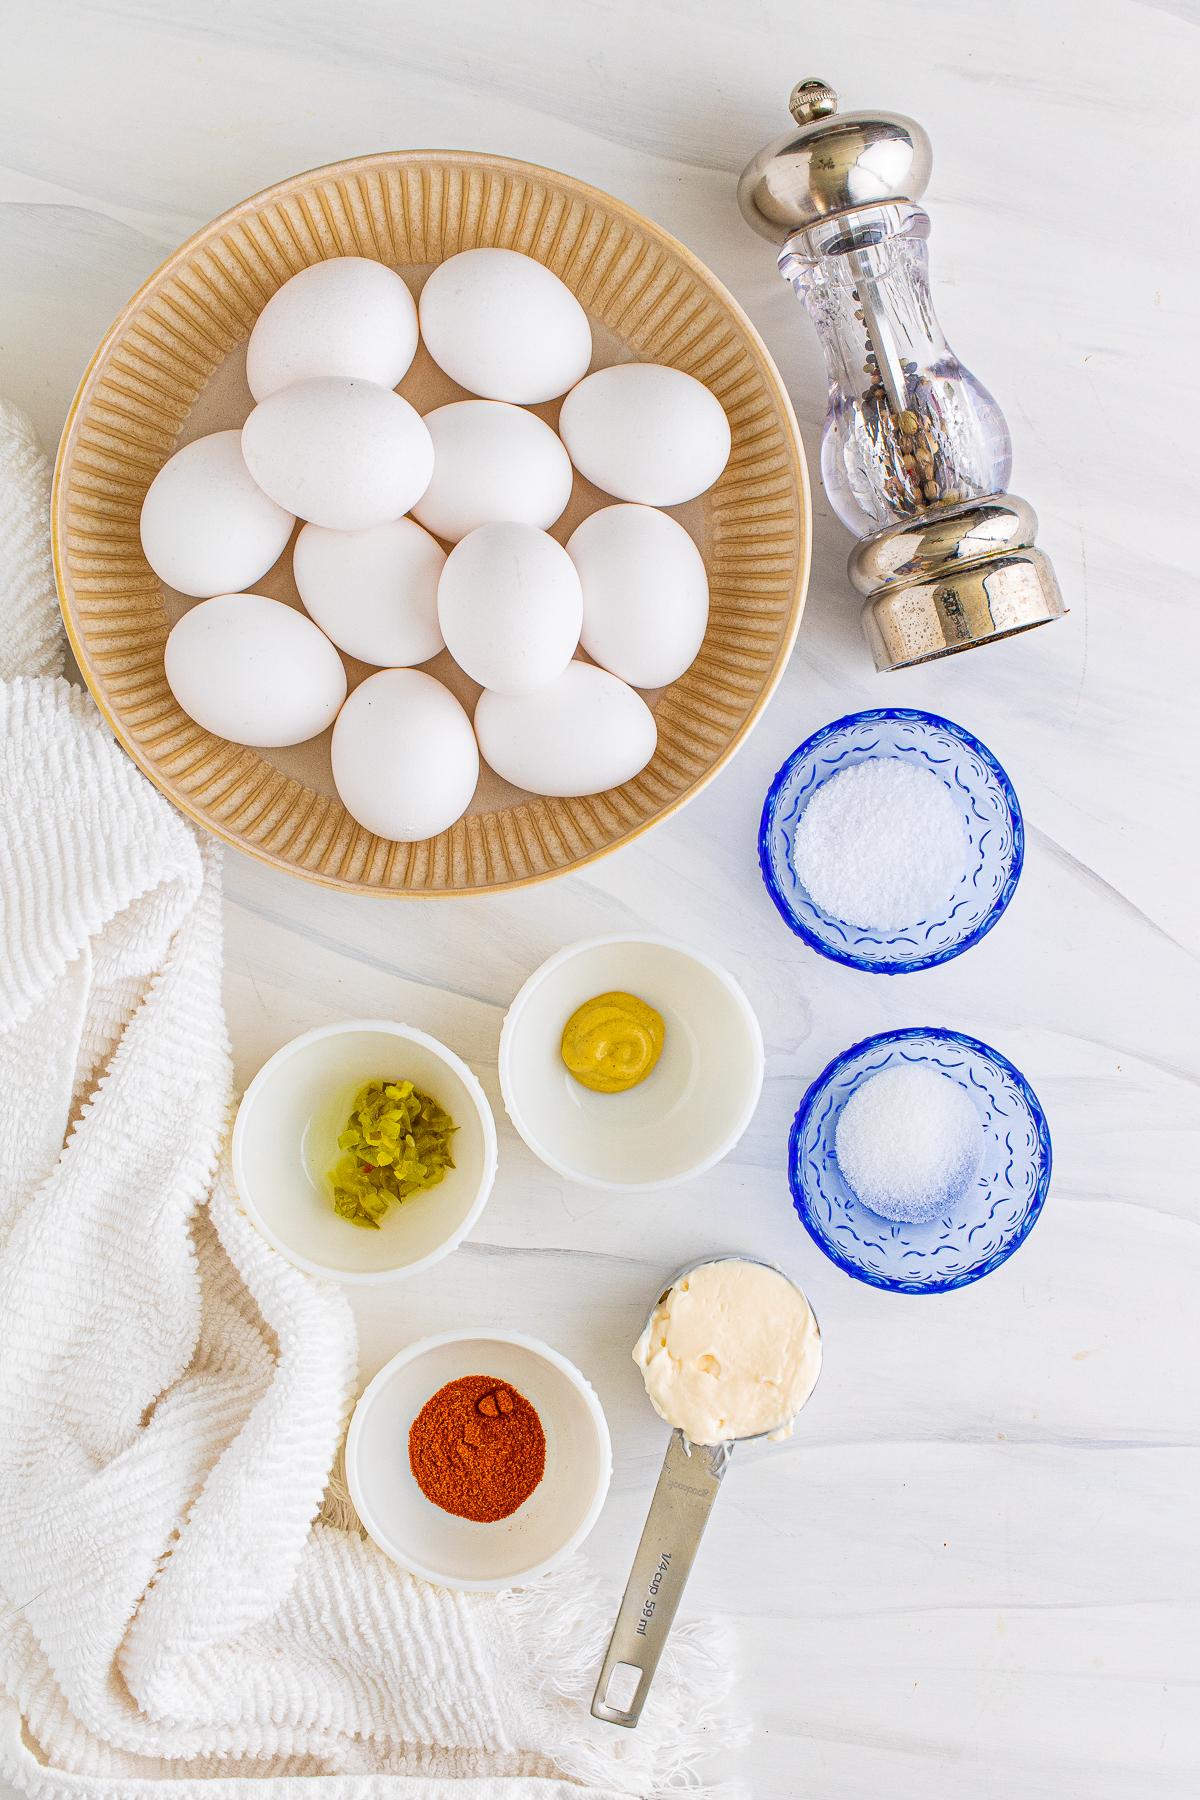 Ingredients needed to make Easy Deviled Eggs